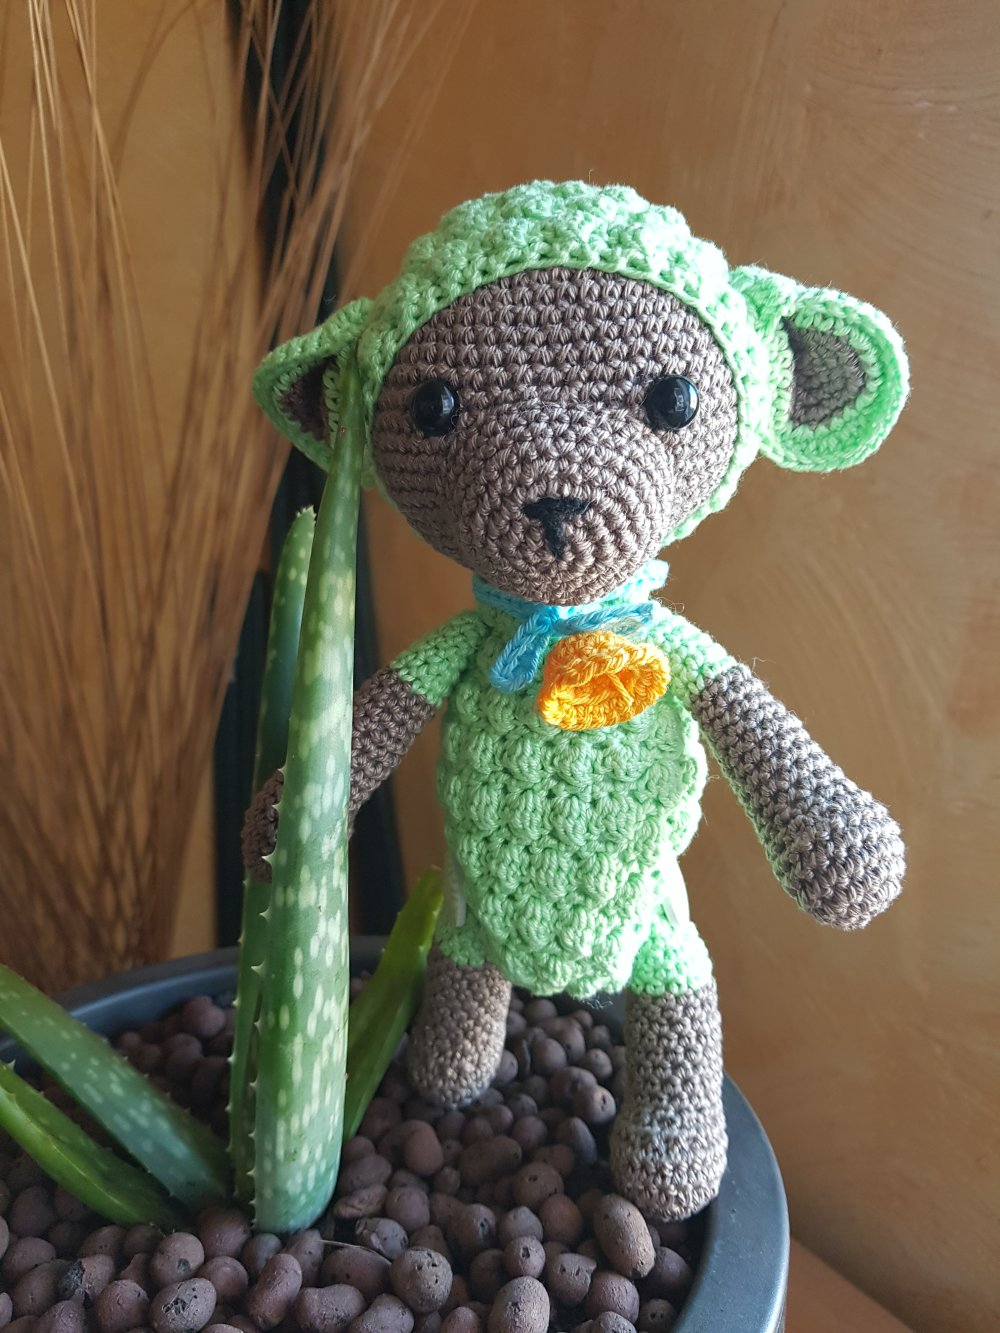 Mano petit mouton modele de croc's betty